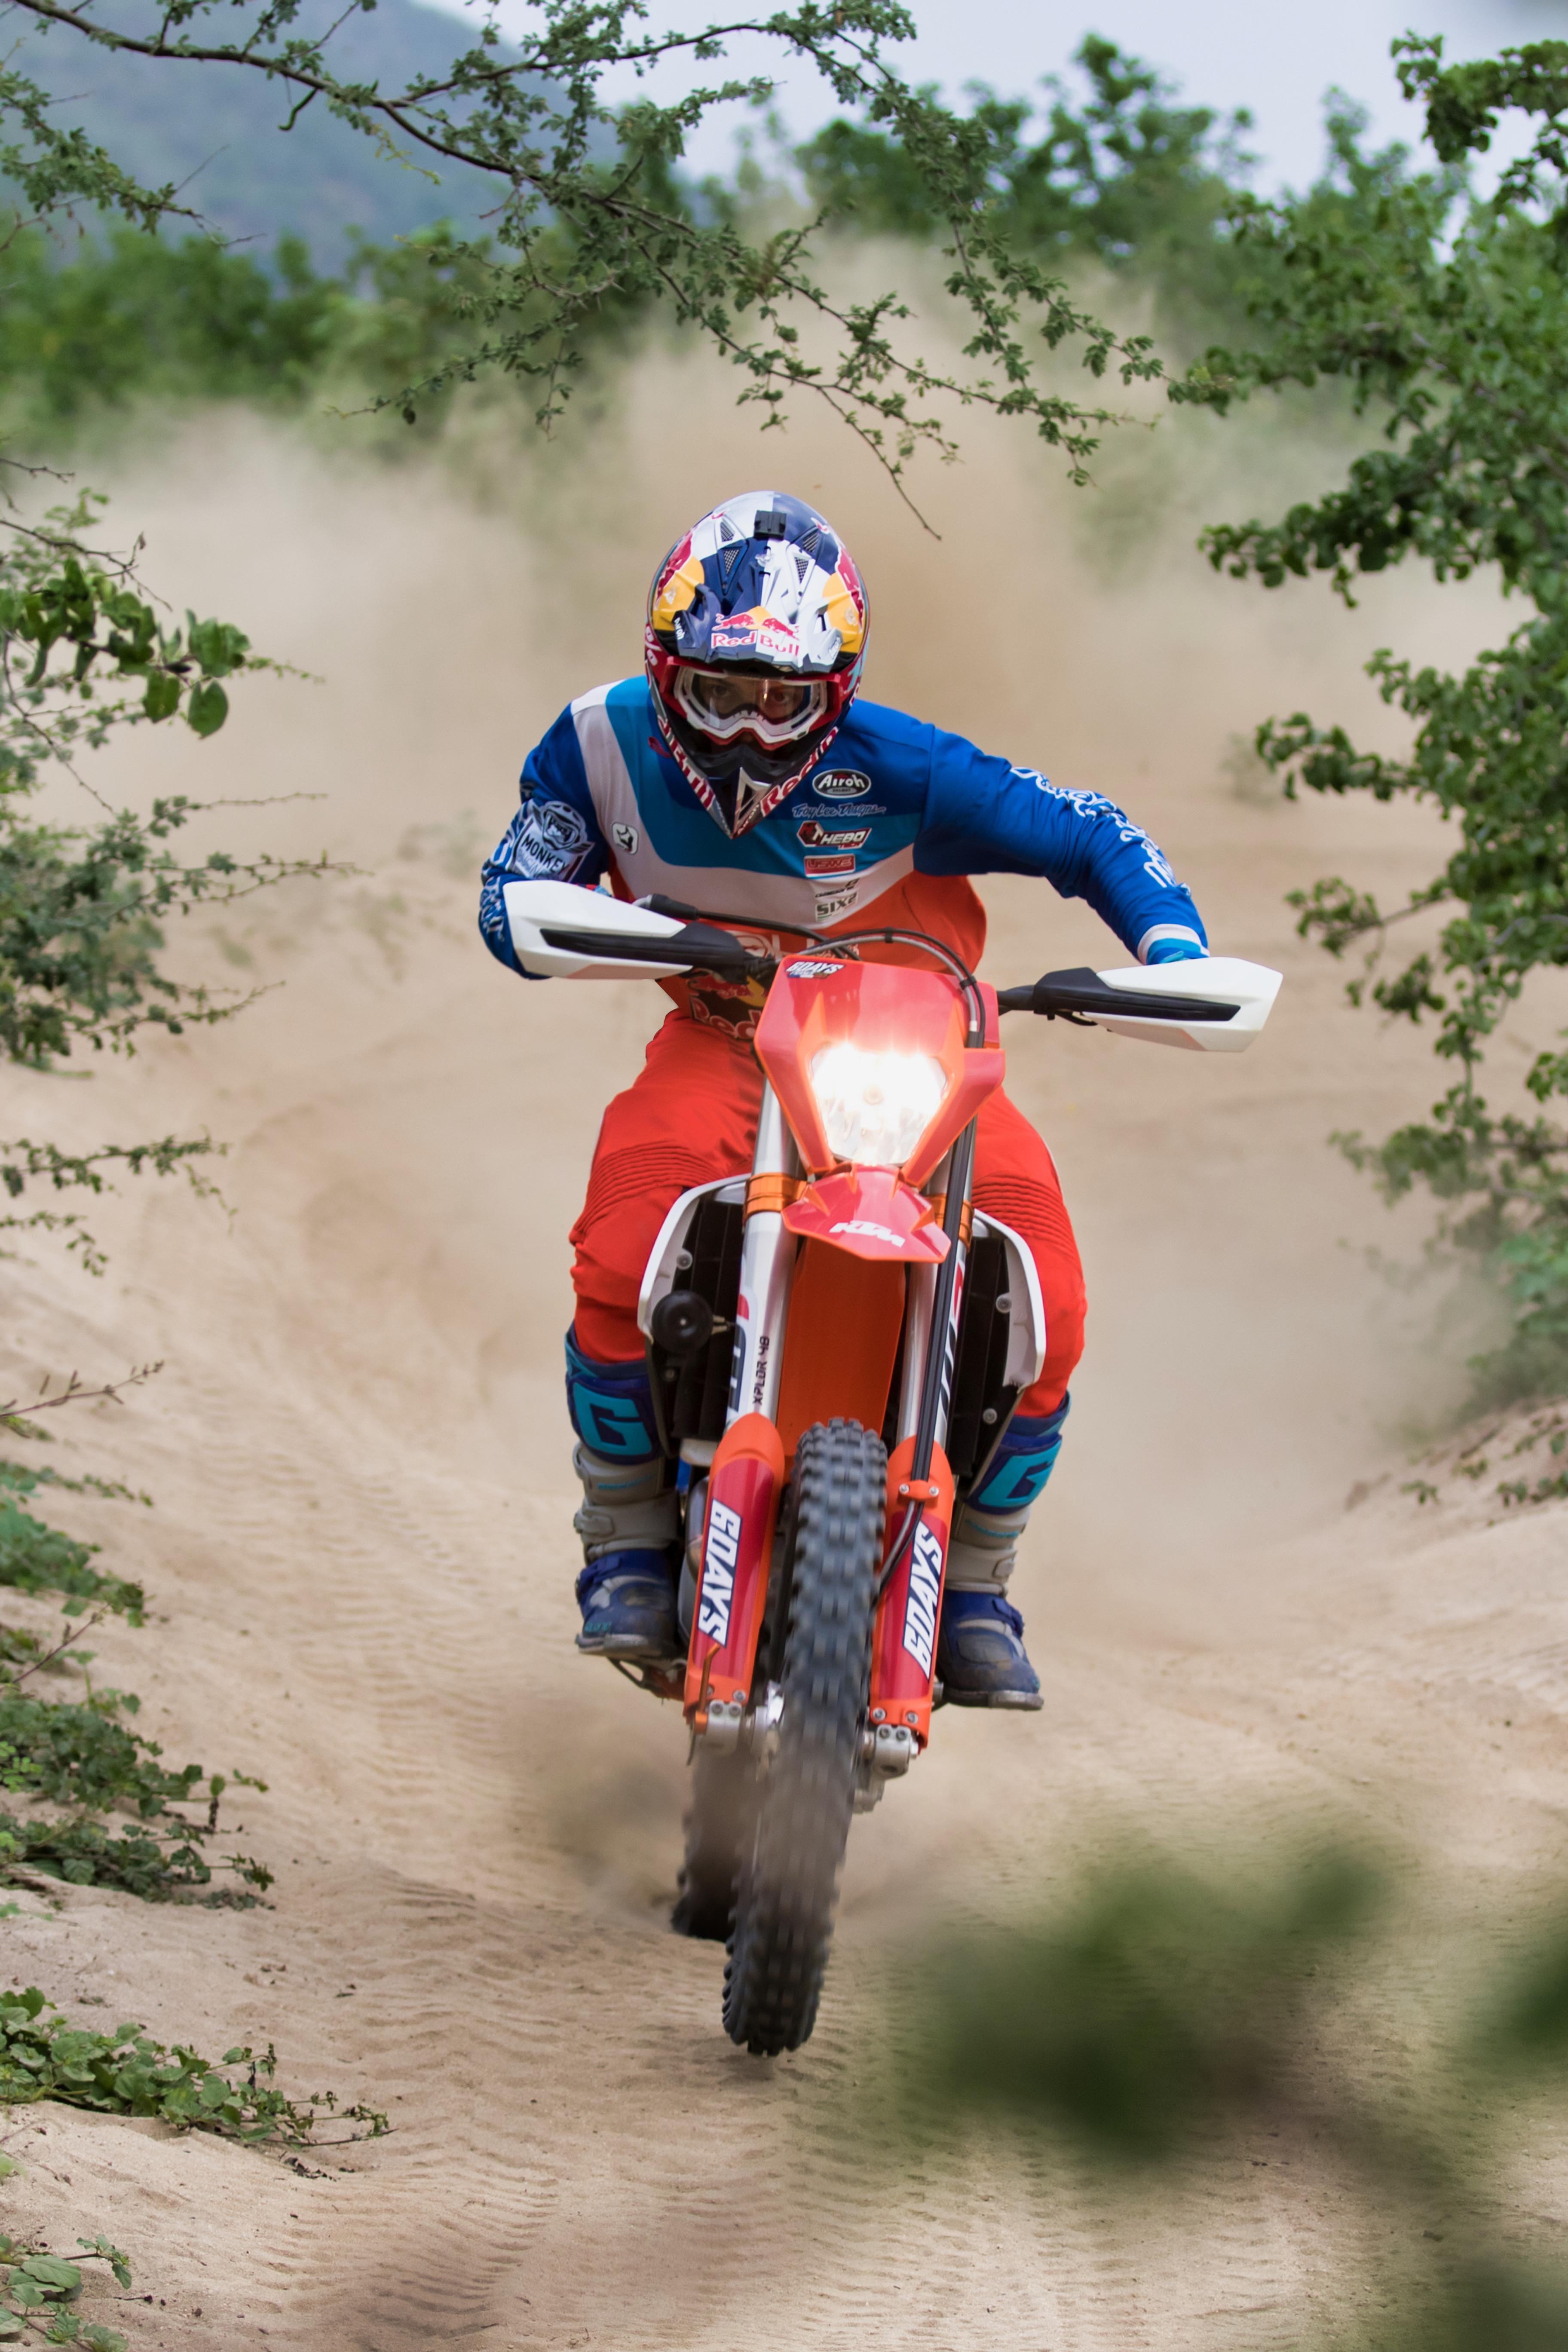 Photoshoot / Rider Profile